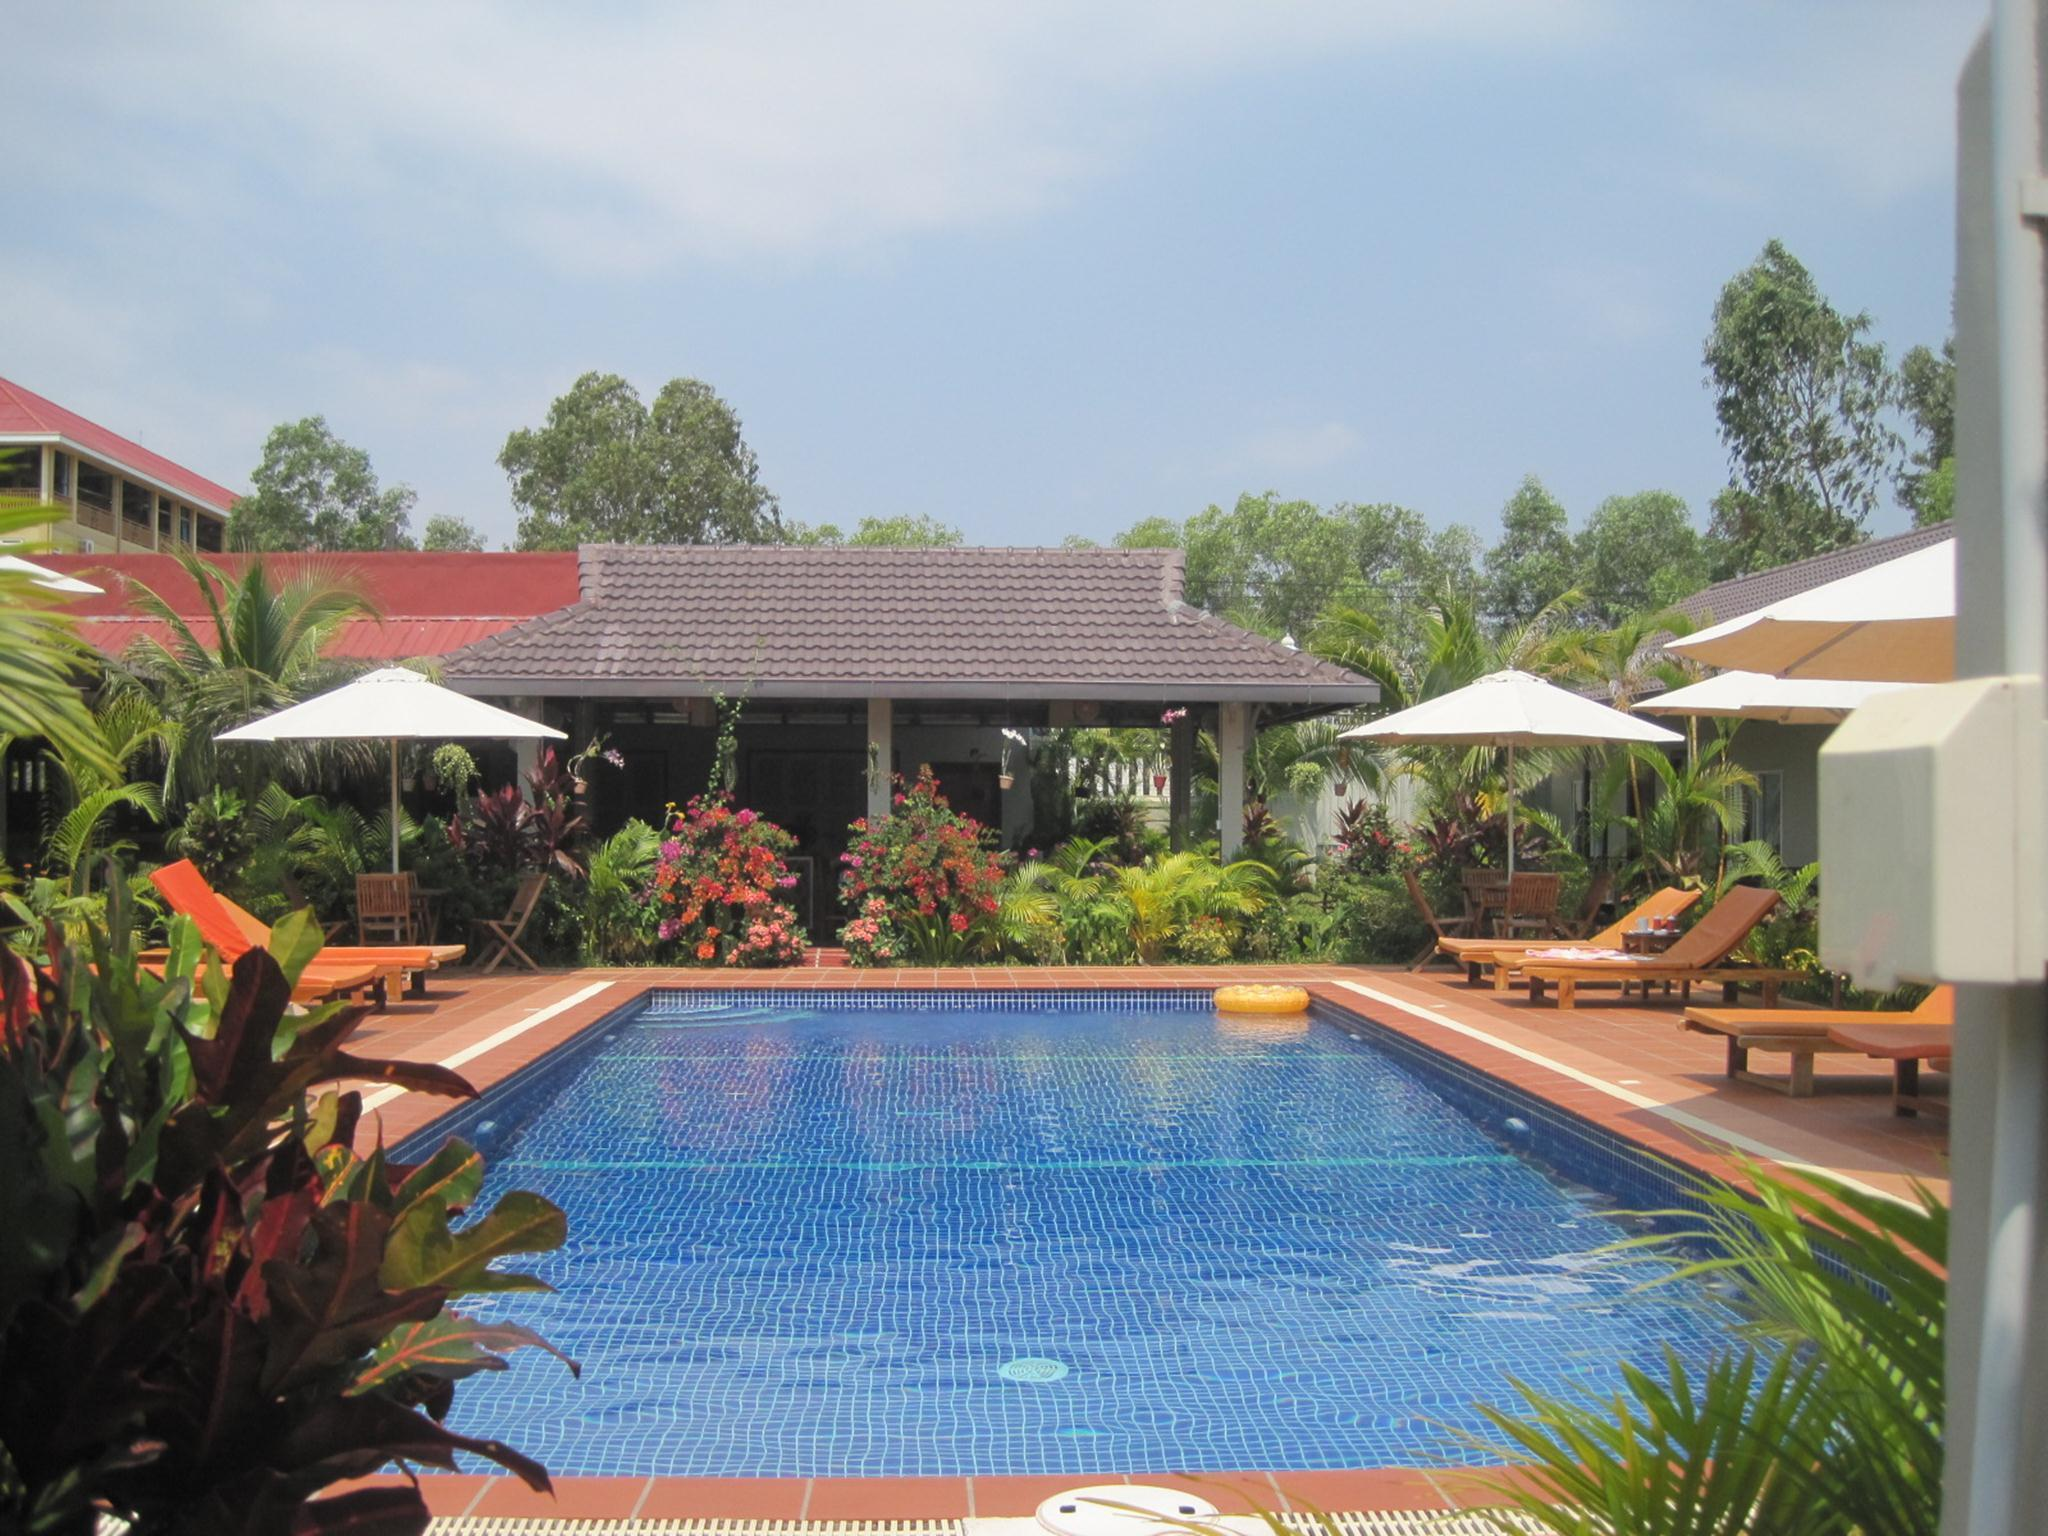 The Tamarind Hotel